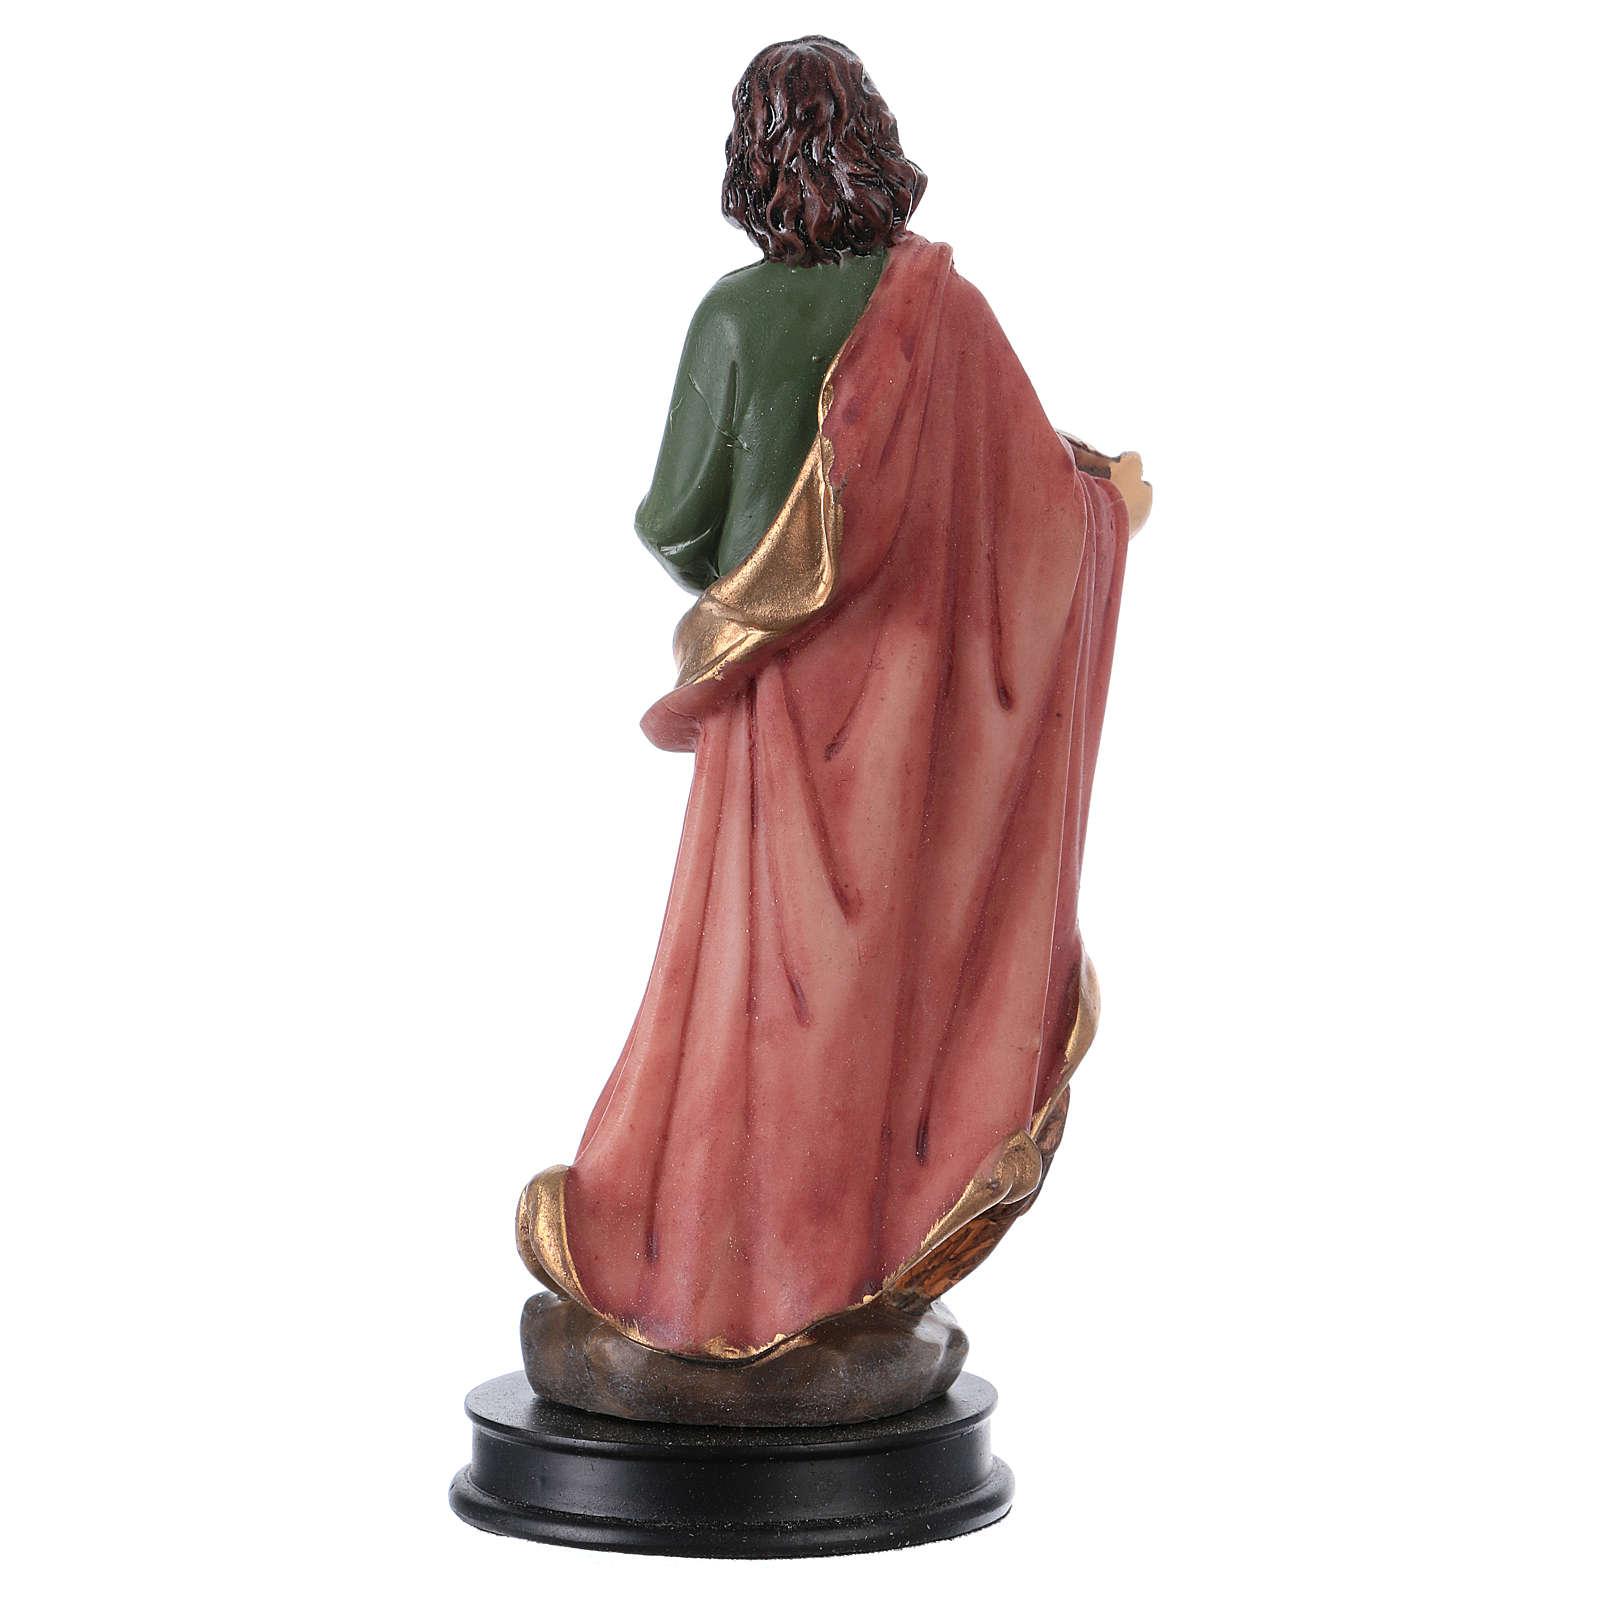 STOCK resin Saint John the apostle statue 13 cm 4